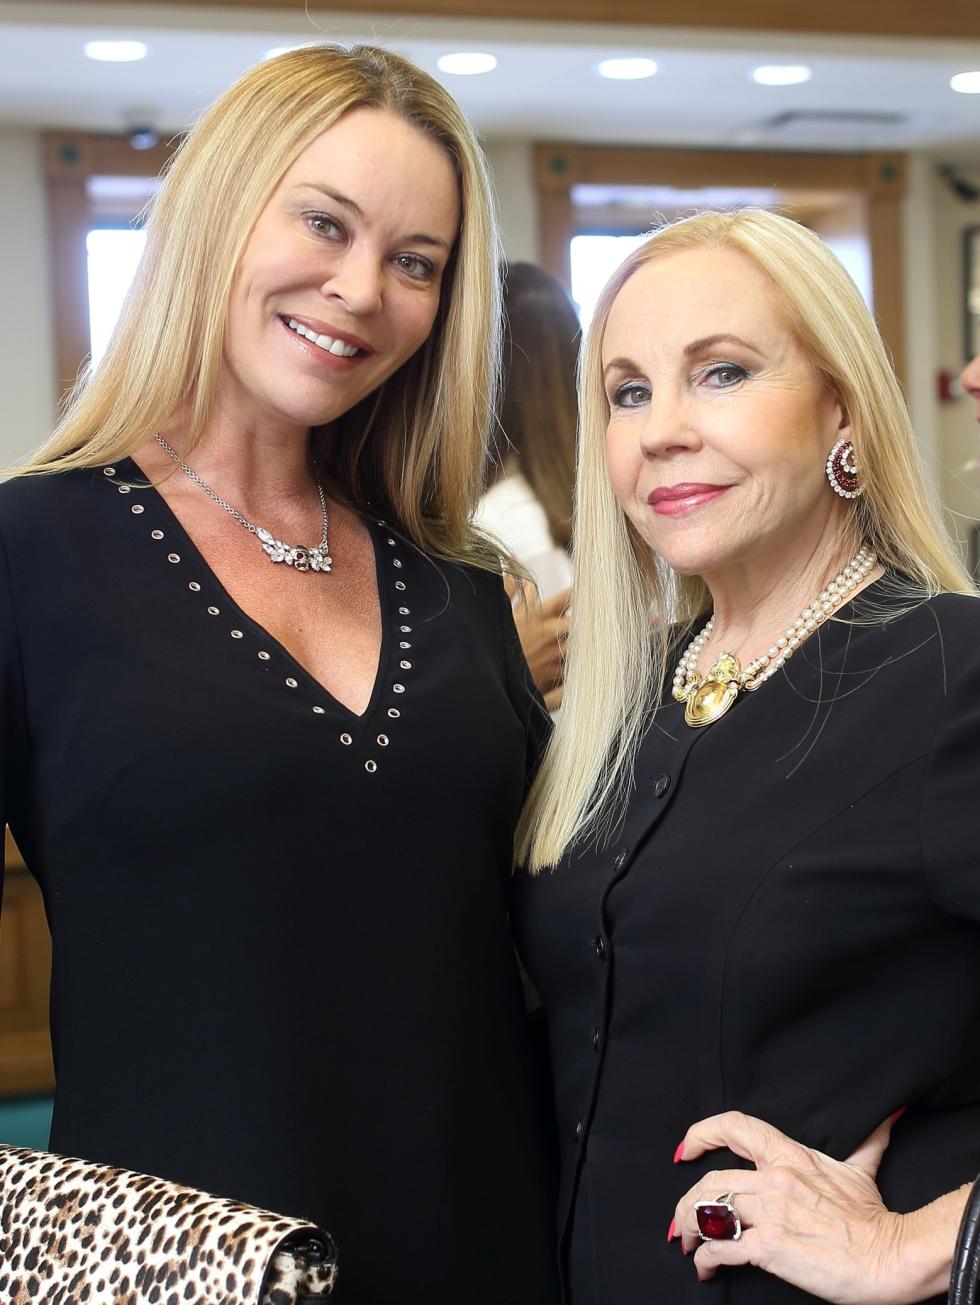 Houston, Una Notte kickoff party, October 2015, Megan Sutton Reed, Carolyn Farb